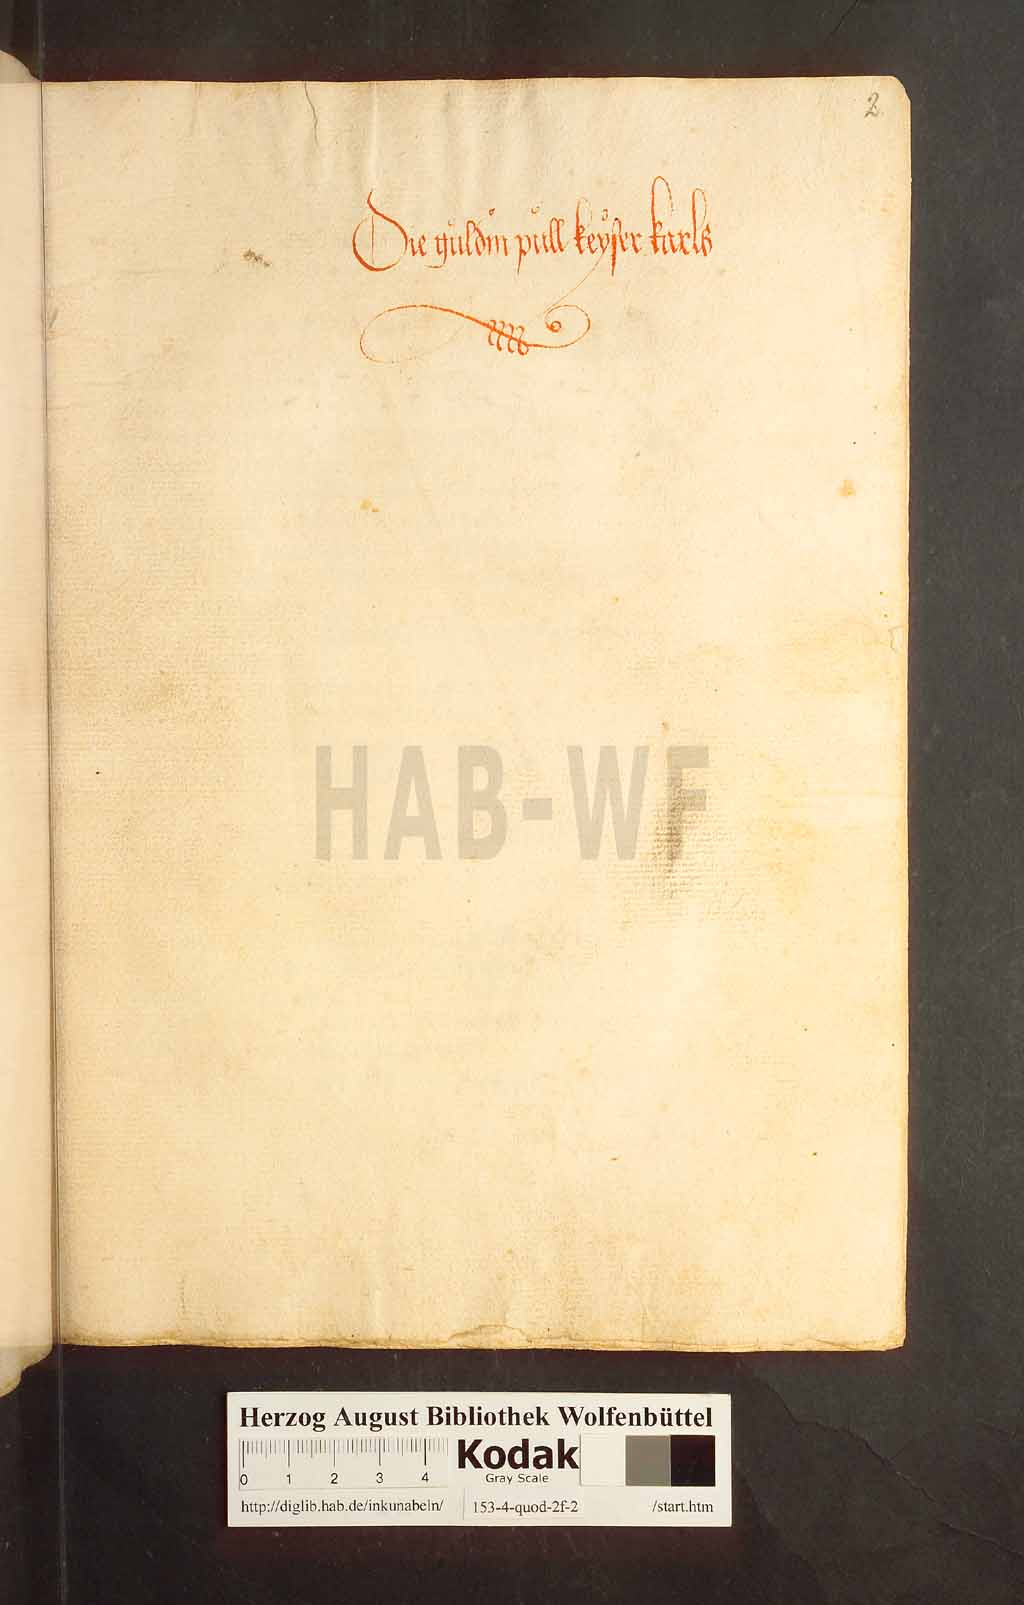 https://diglib.hab.de/inkunabeln/153-4-quod-2f-2/00001.jpg